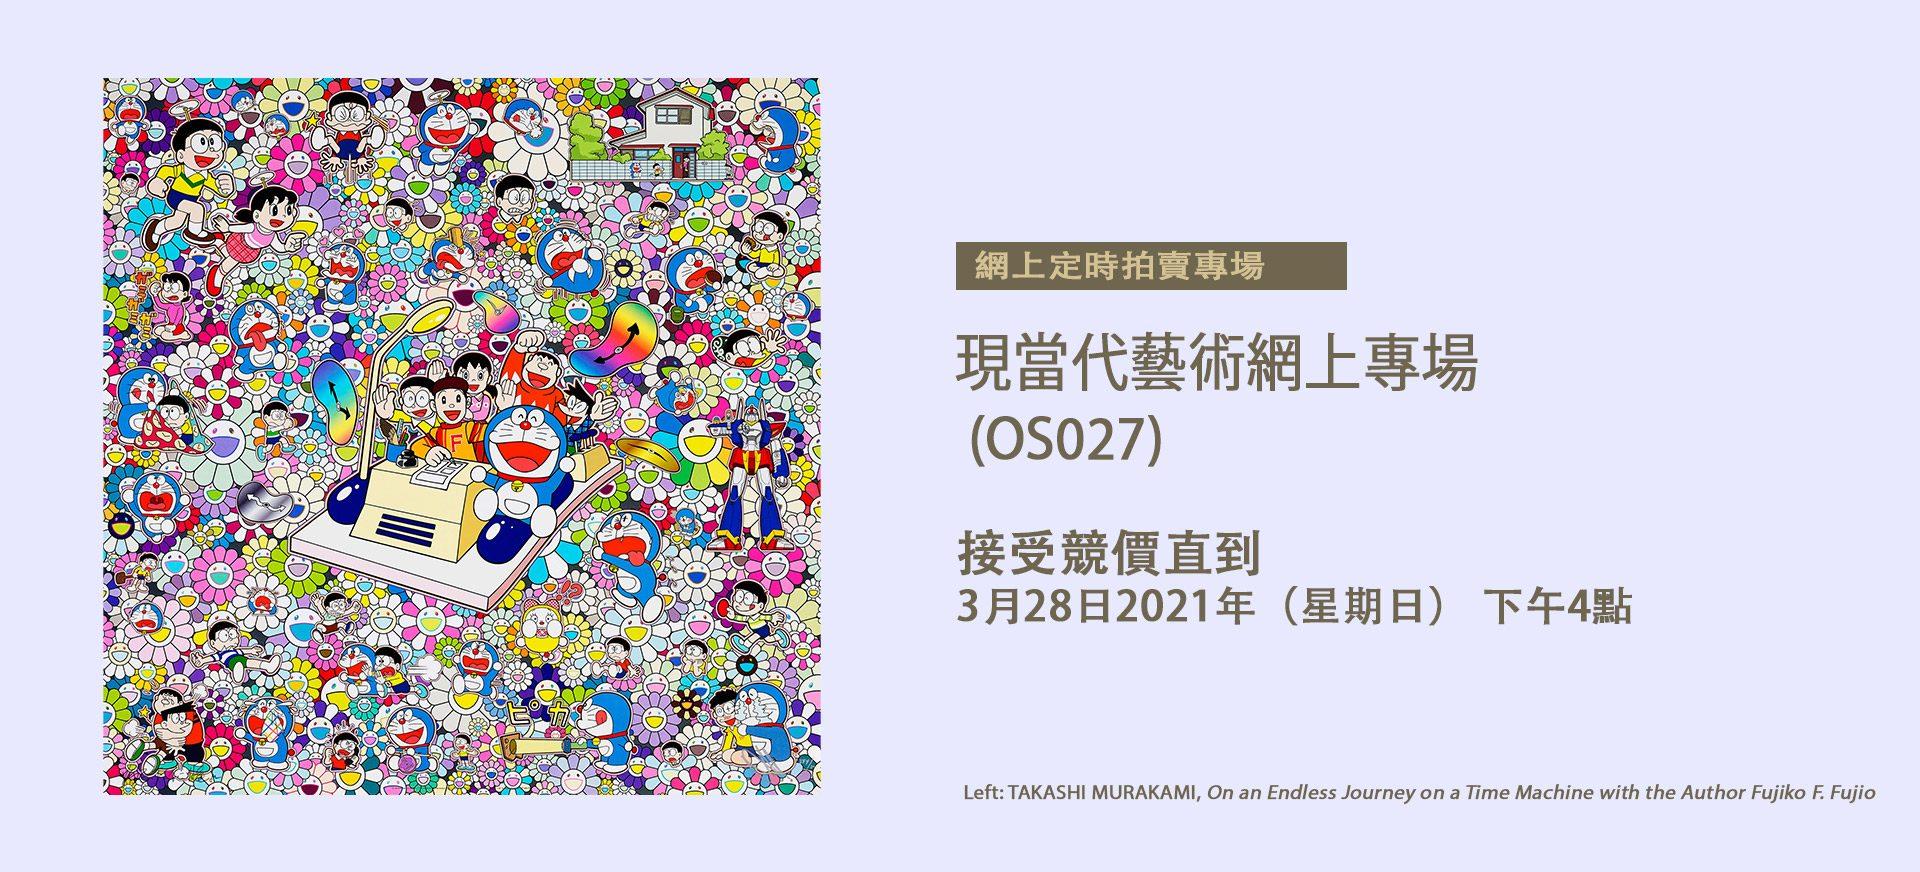 1920x872_slider_os027_murakami_cn